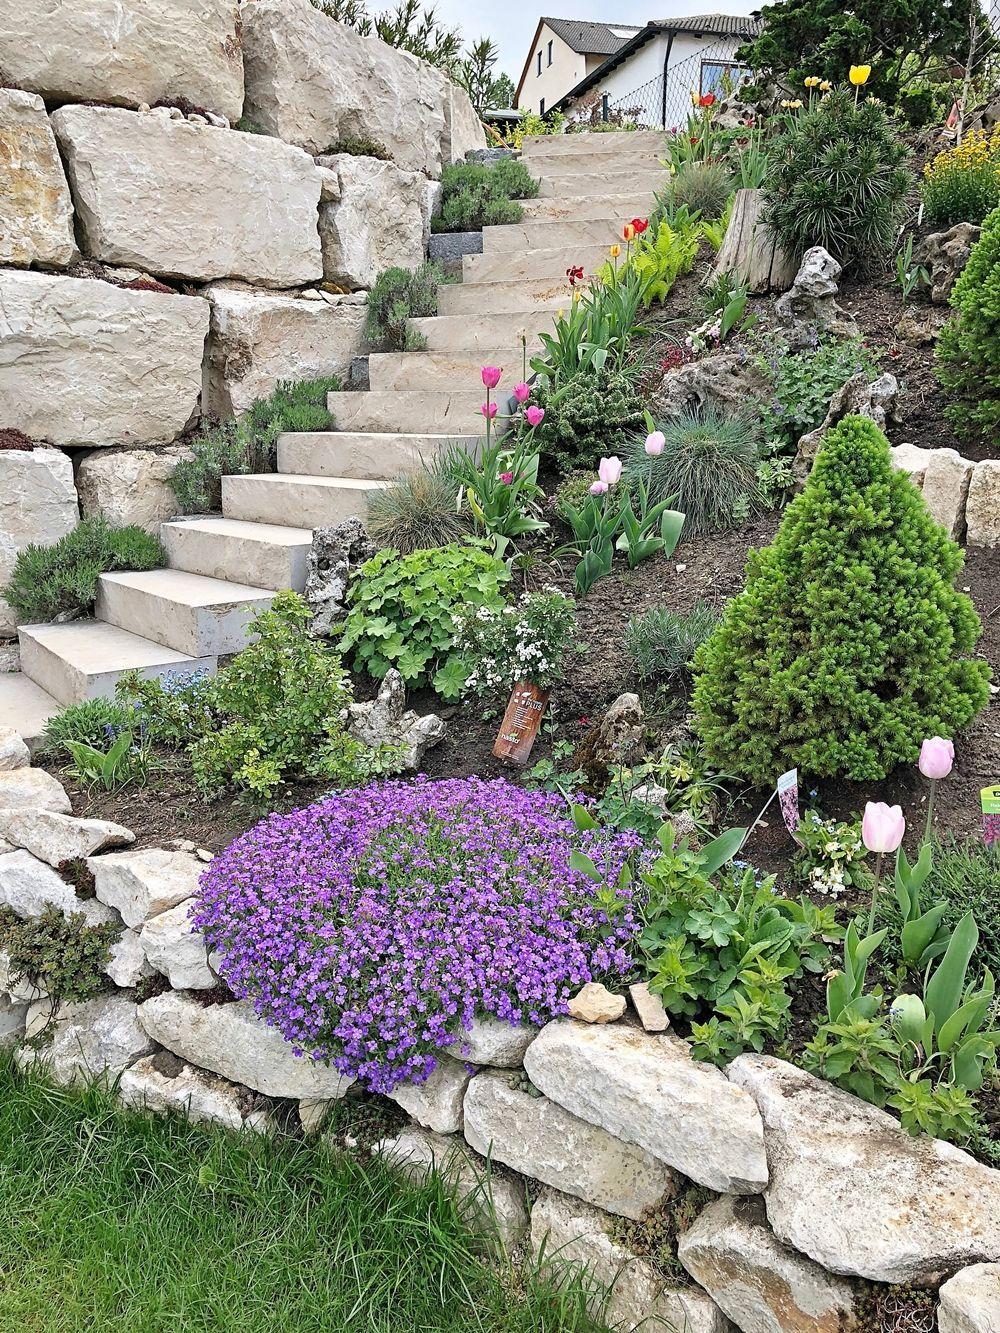 Patiolandscaping Der Garten Im Fruhling Fashion Kitchen Patio Landscaping Ideas Patiodesignssmallyard In 2020 Pool Landscaping Plants Garden Patio Landscaping